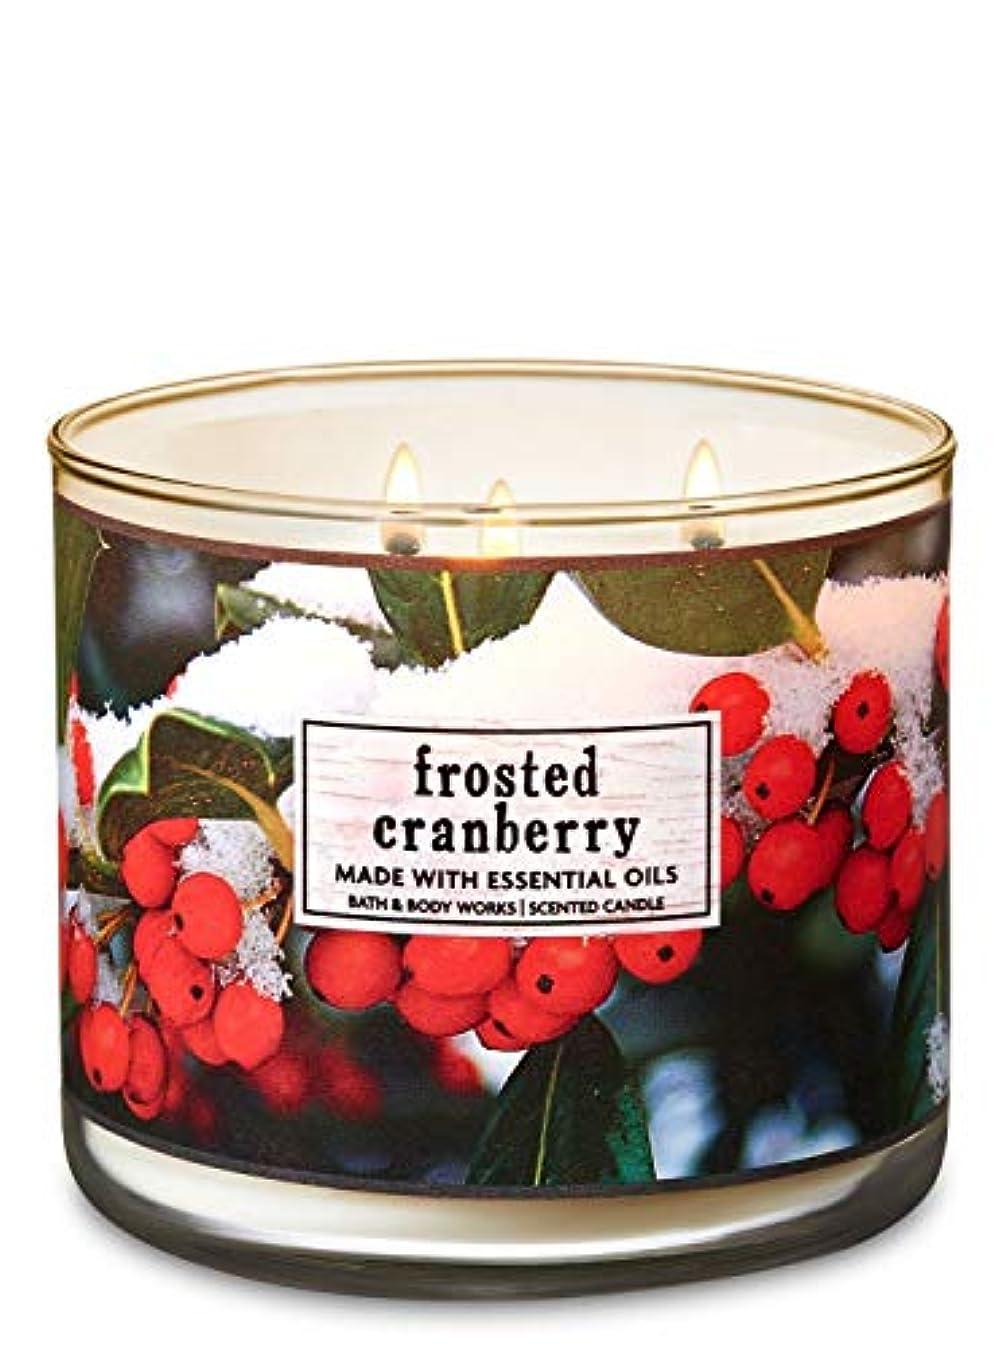 【Bath&Body Works/バス&ボディワークス】 アロマキャンドル フロステッドクランベリー 3-Wick Scented Candle Frosted Cranberry 14.5oz/411g [並行輸入品]